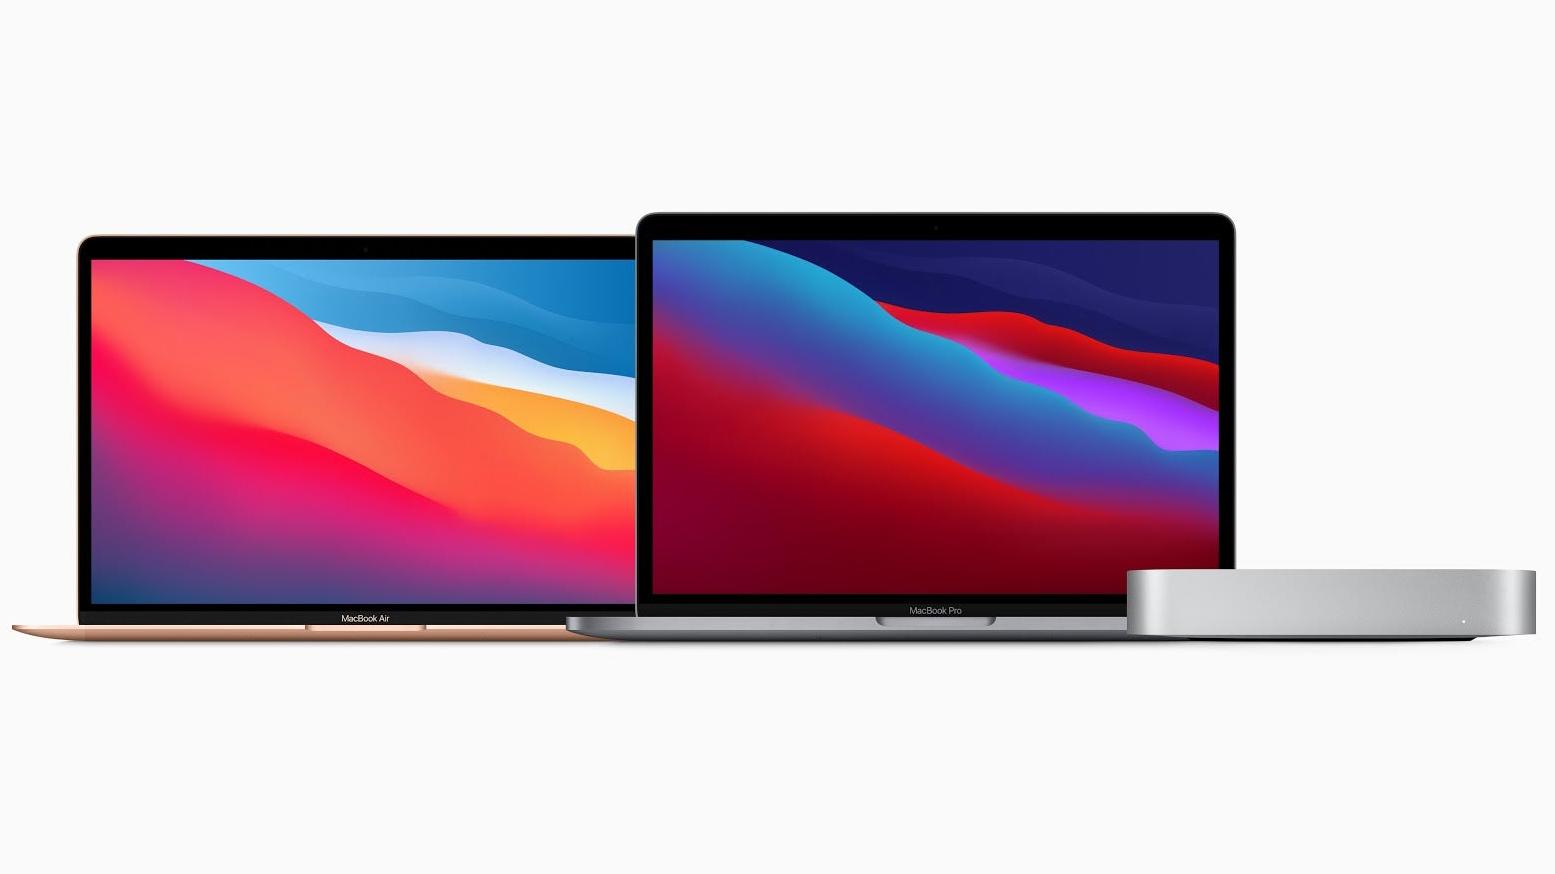 M1 MacBook